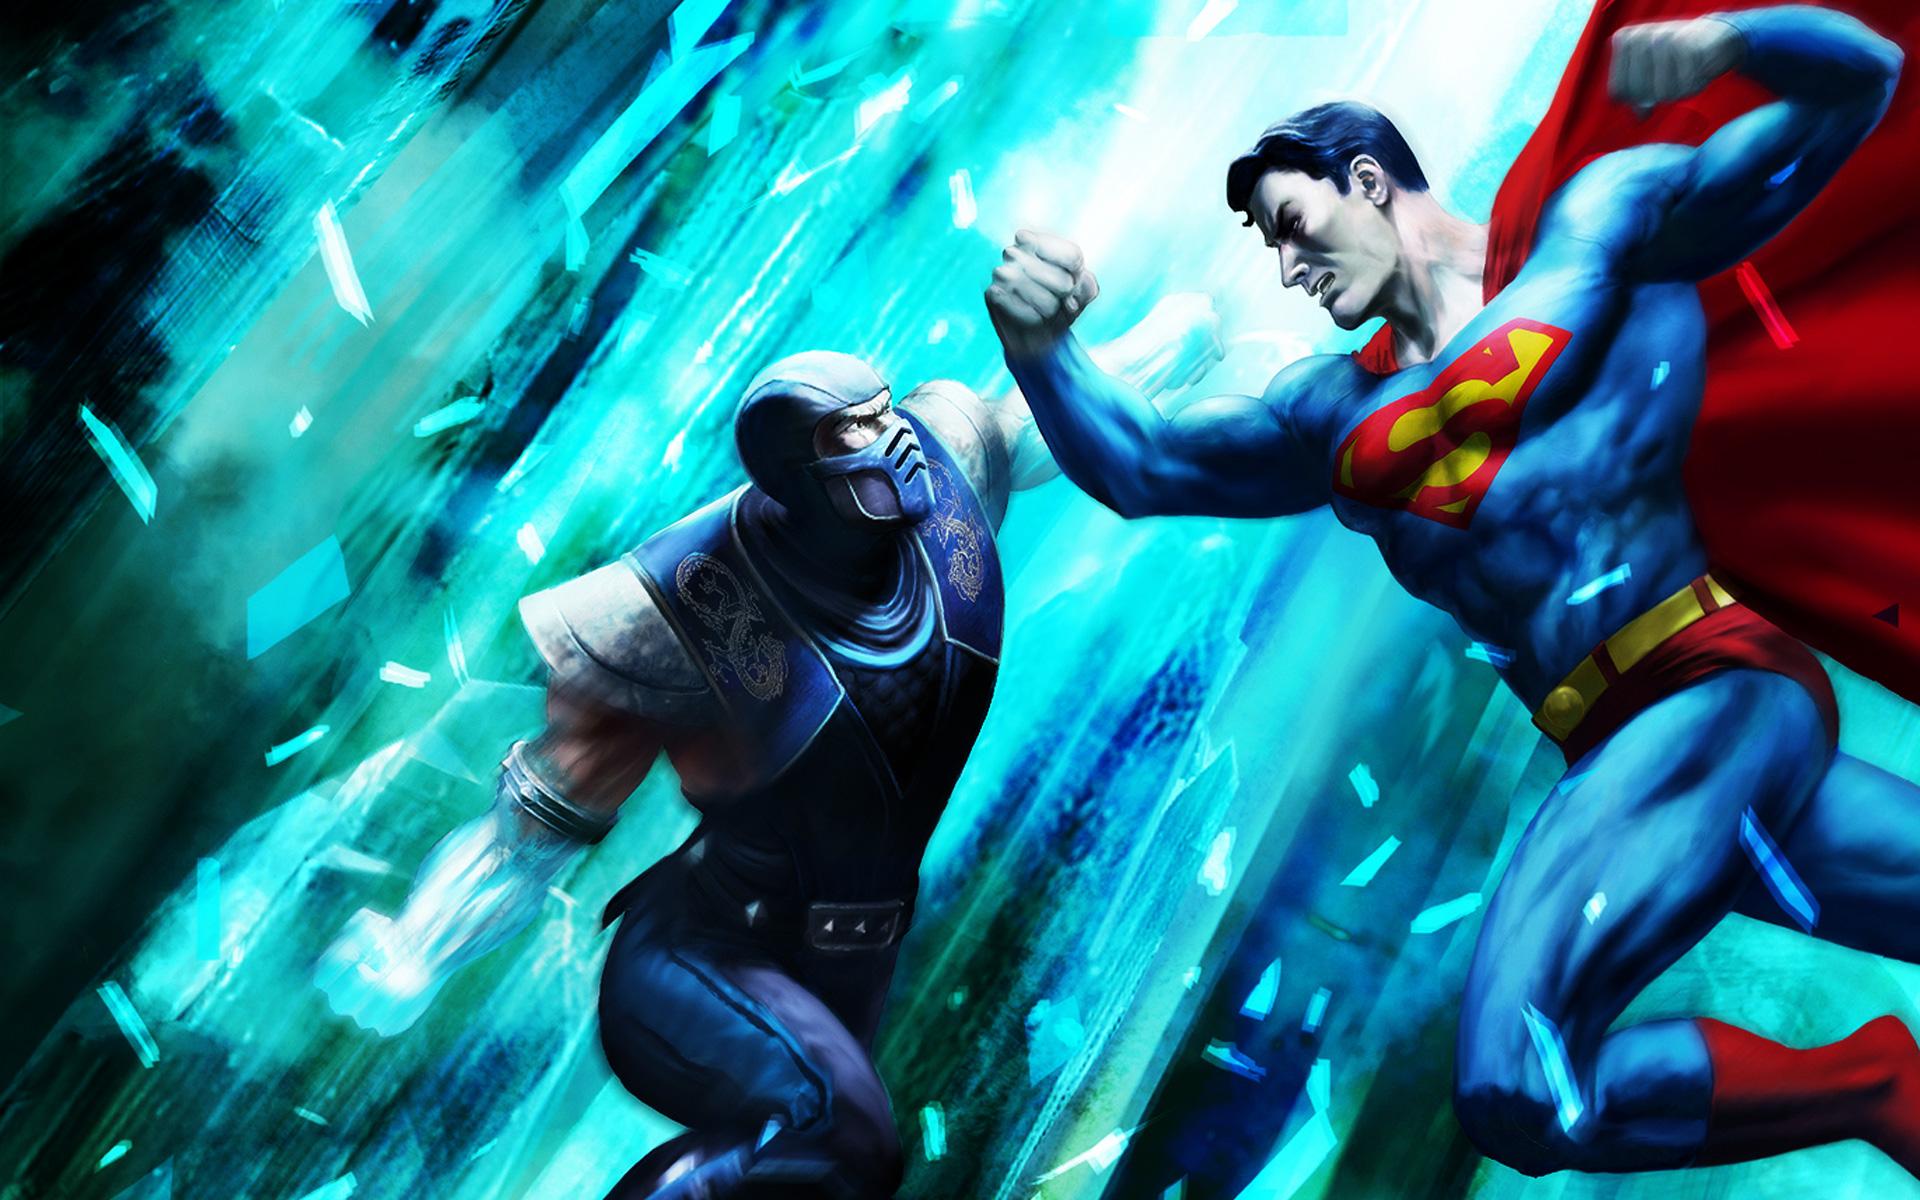 Mortal Kombat vs. DC Universe Wallpaper in 1920x1200